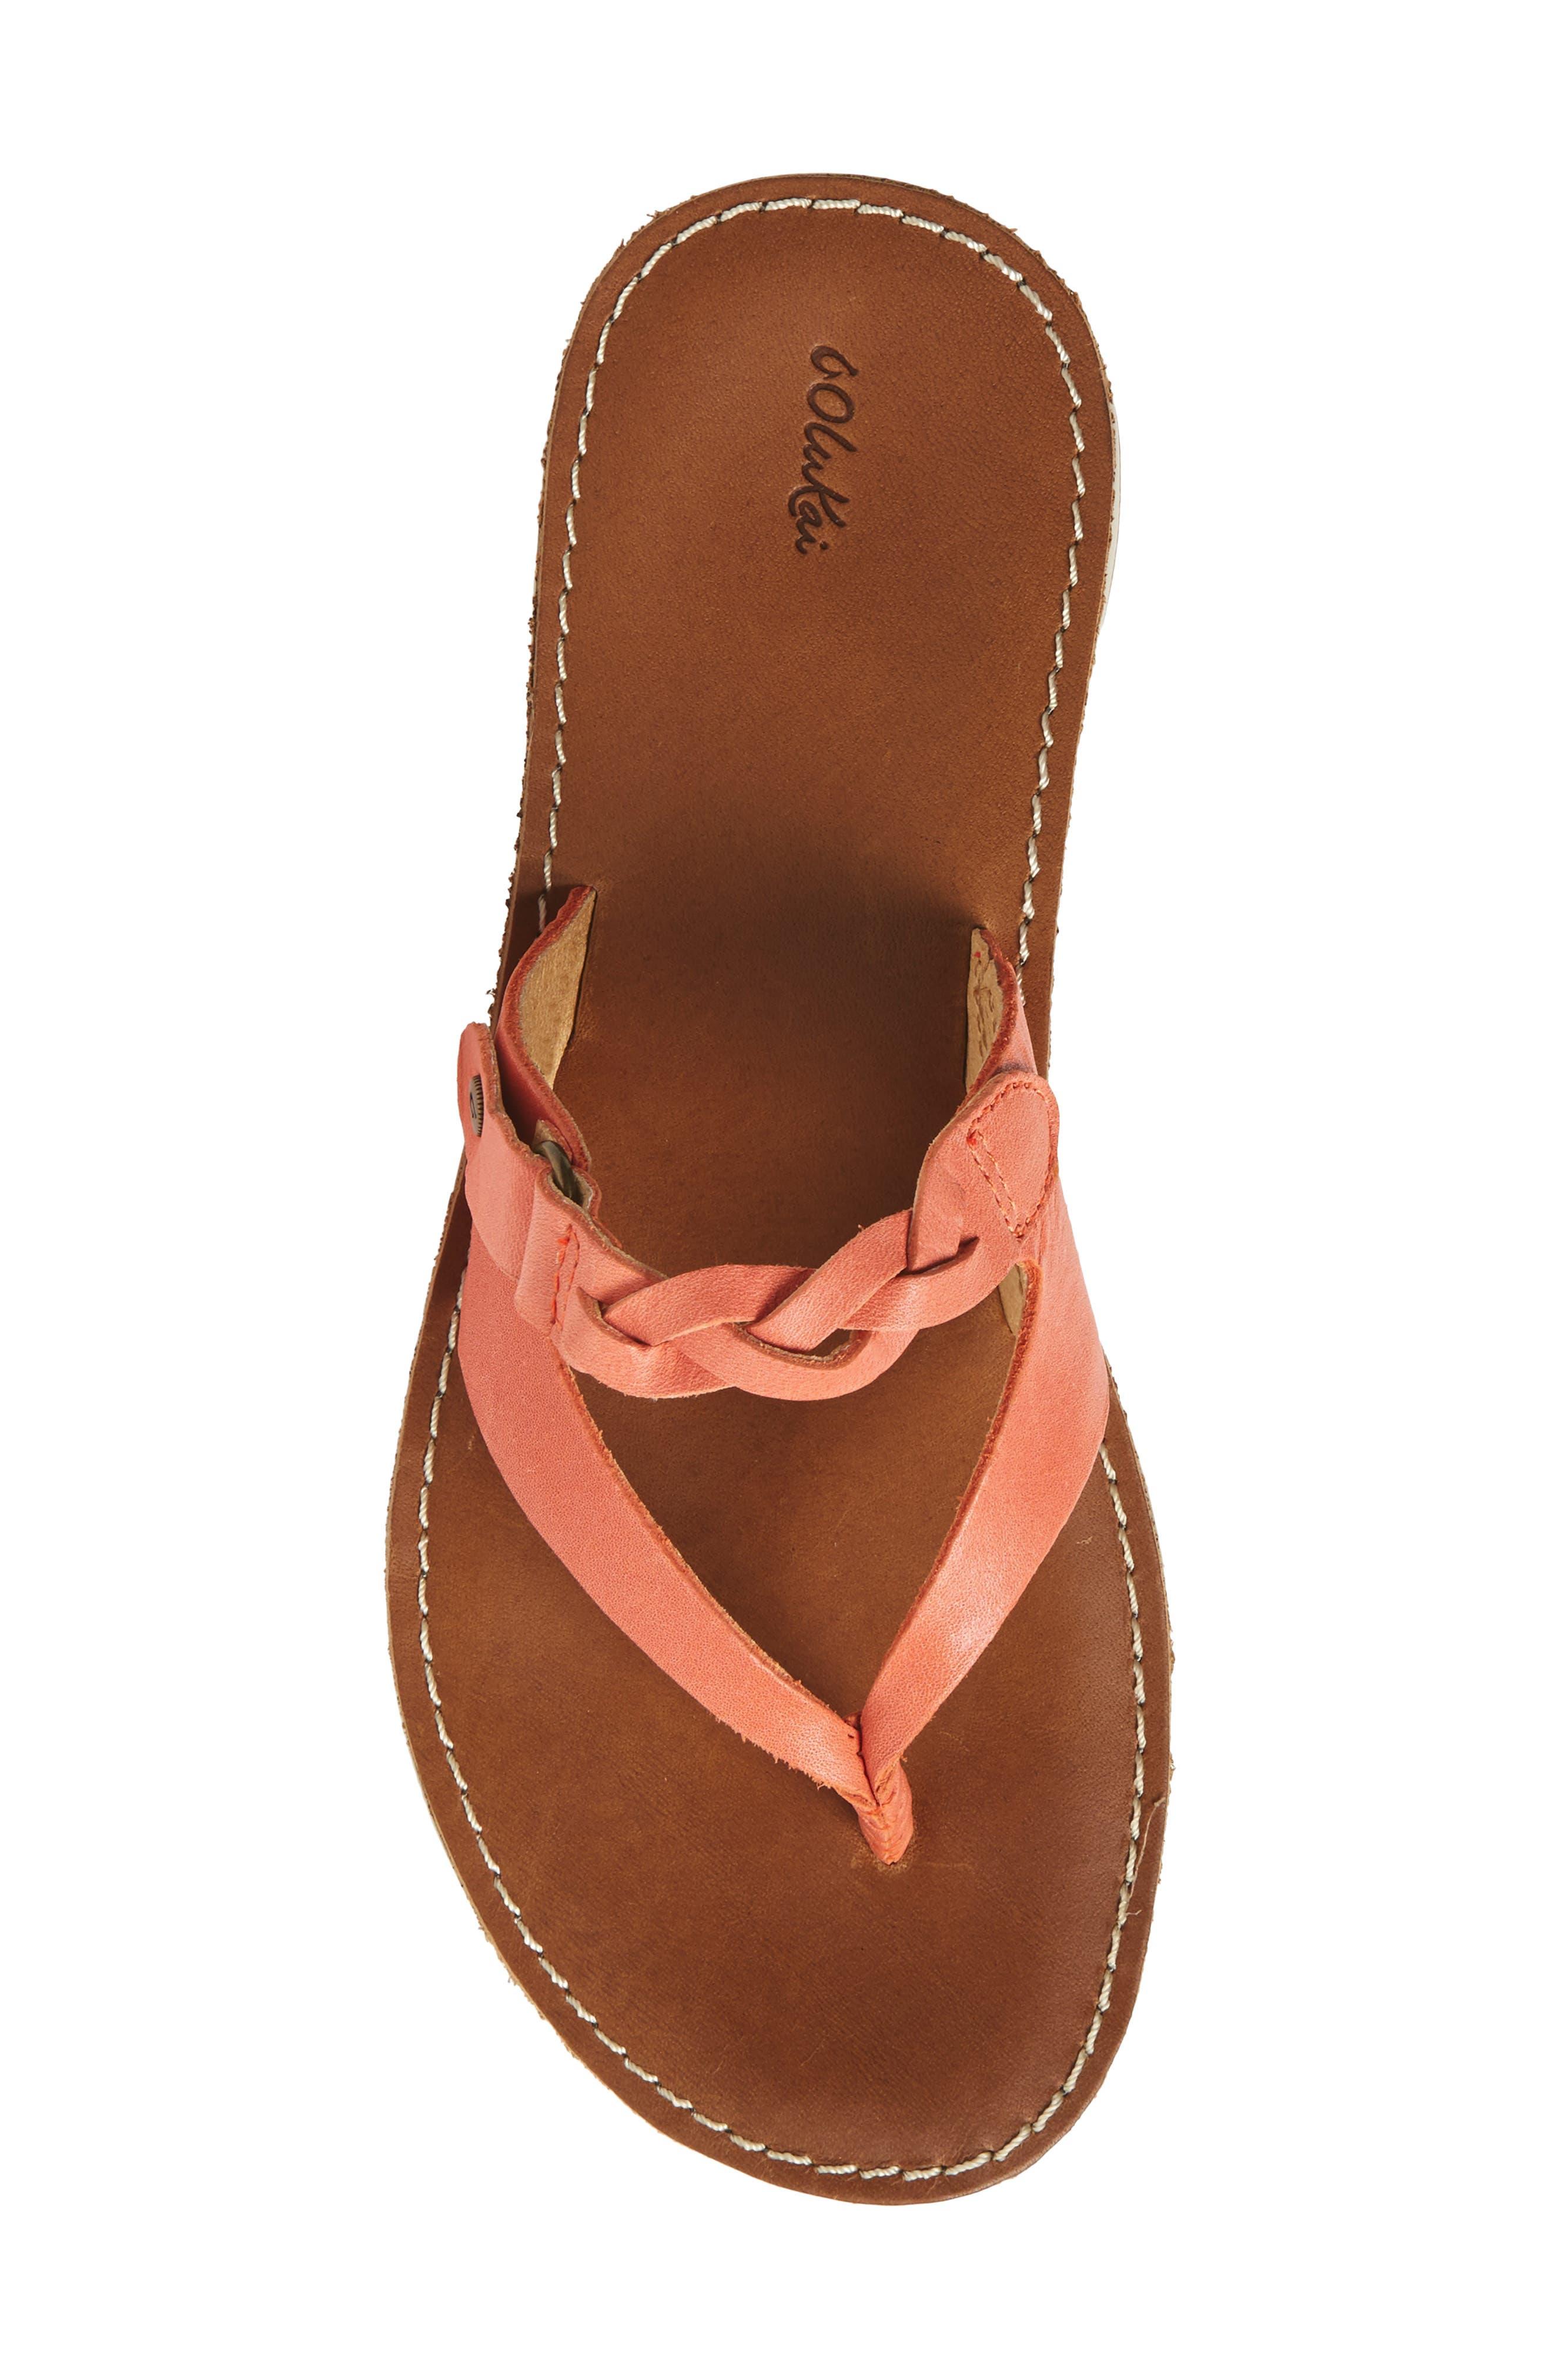 Kahikolu Flip Flop,                             Alternate thumbnail 5, color,                             Peach/ Tan Leather